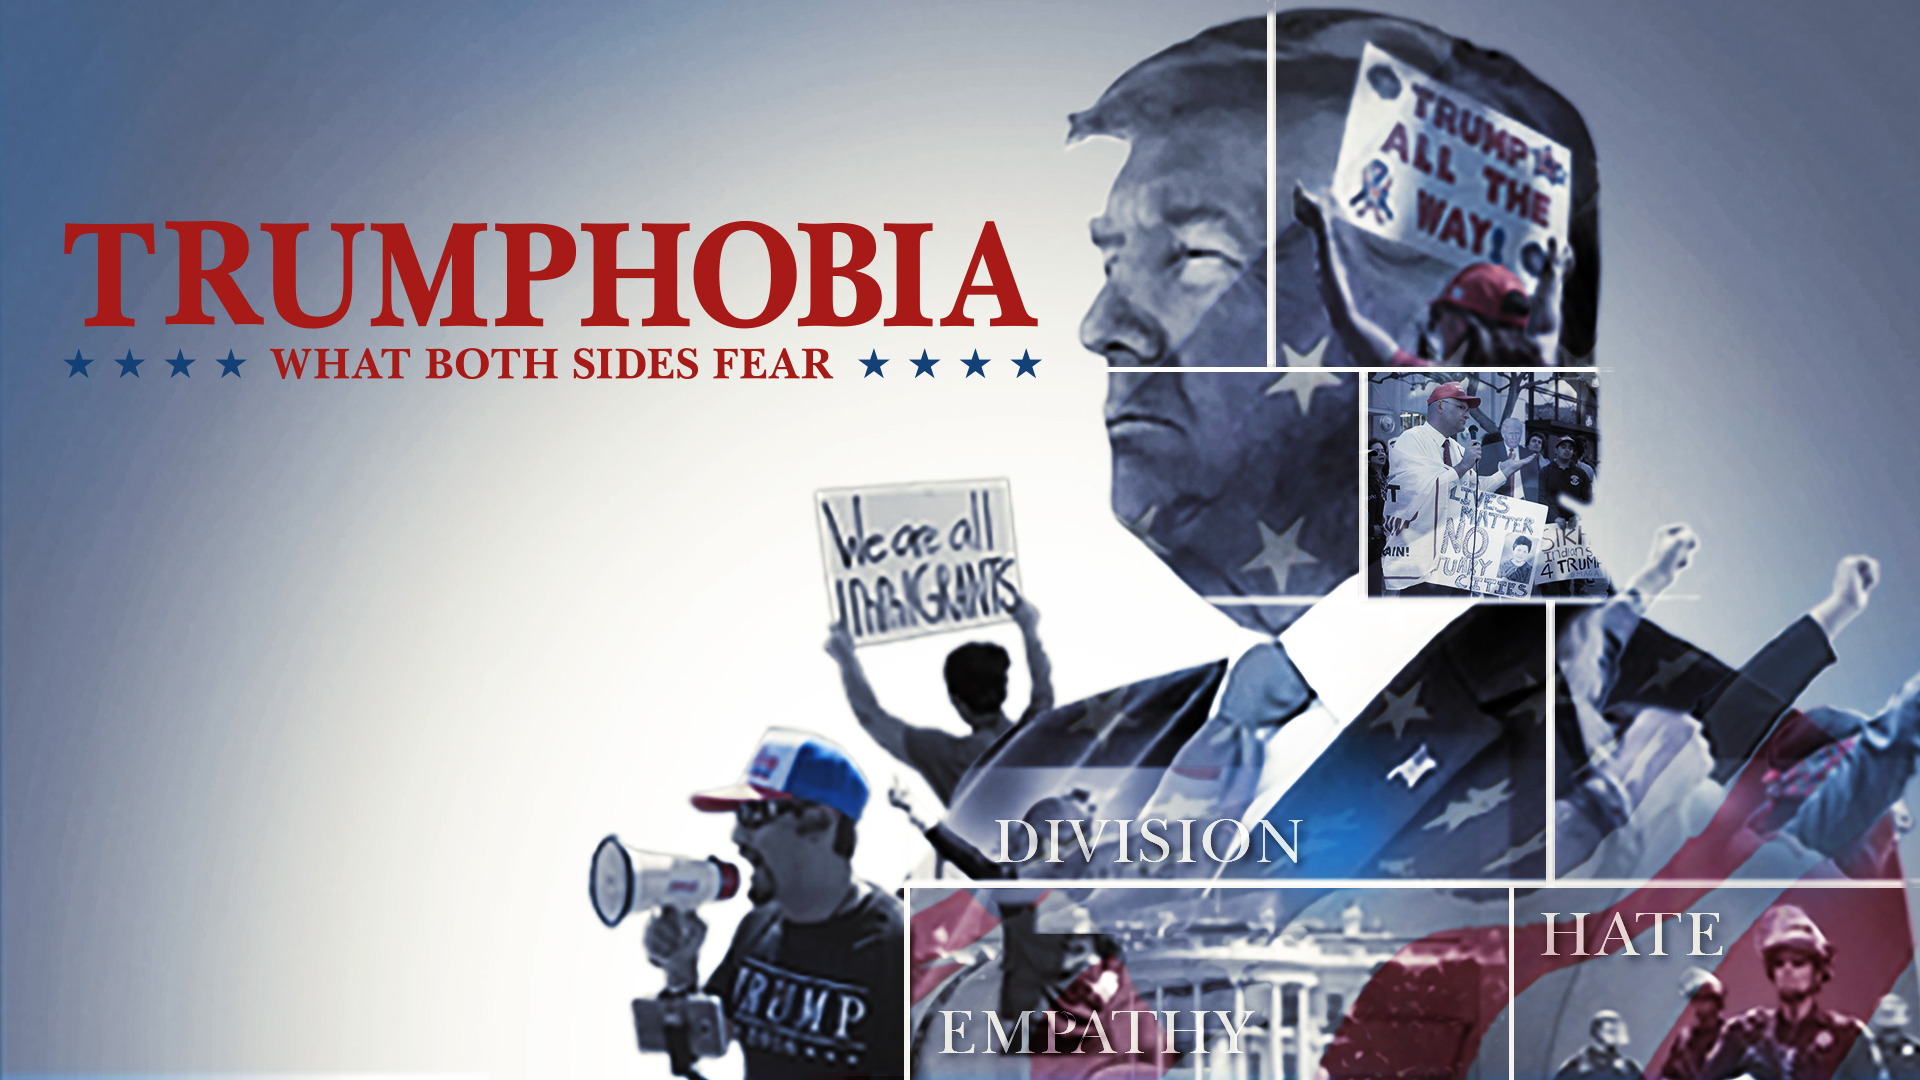 Trumphobia